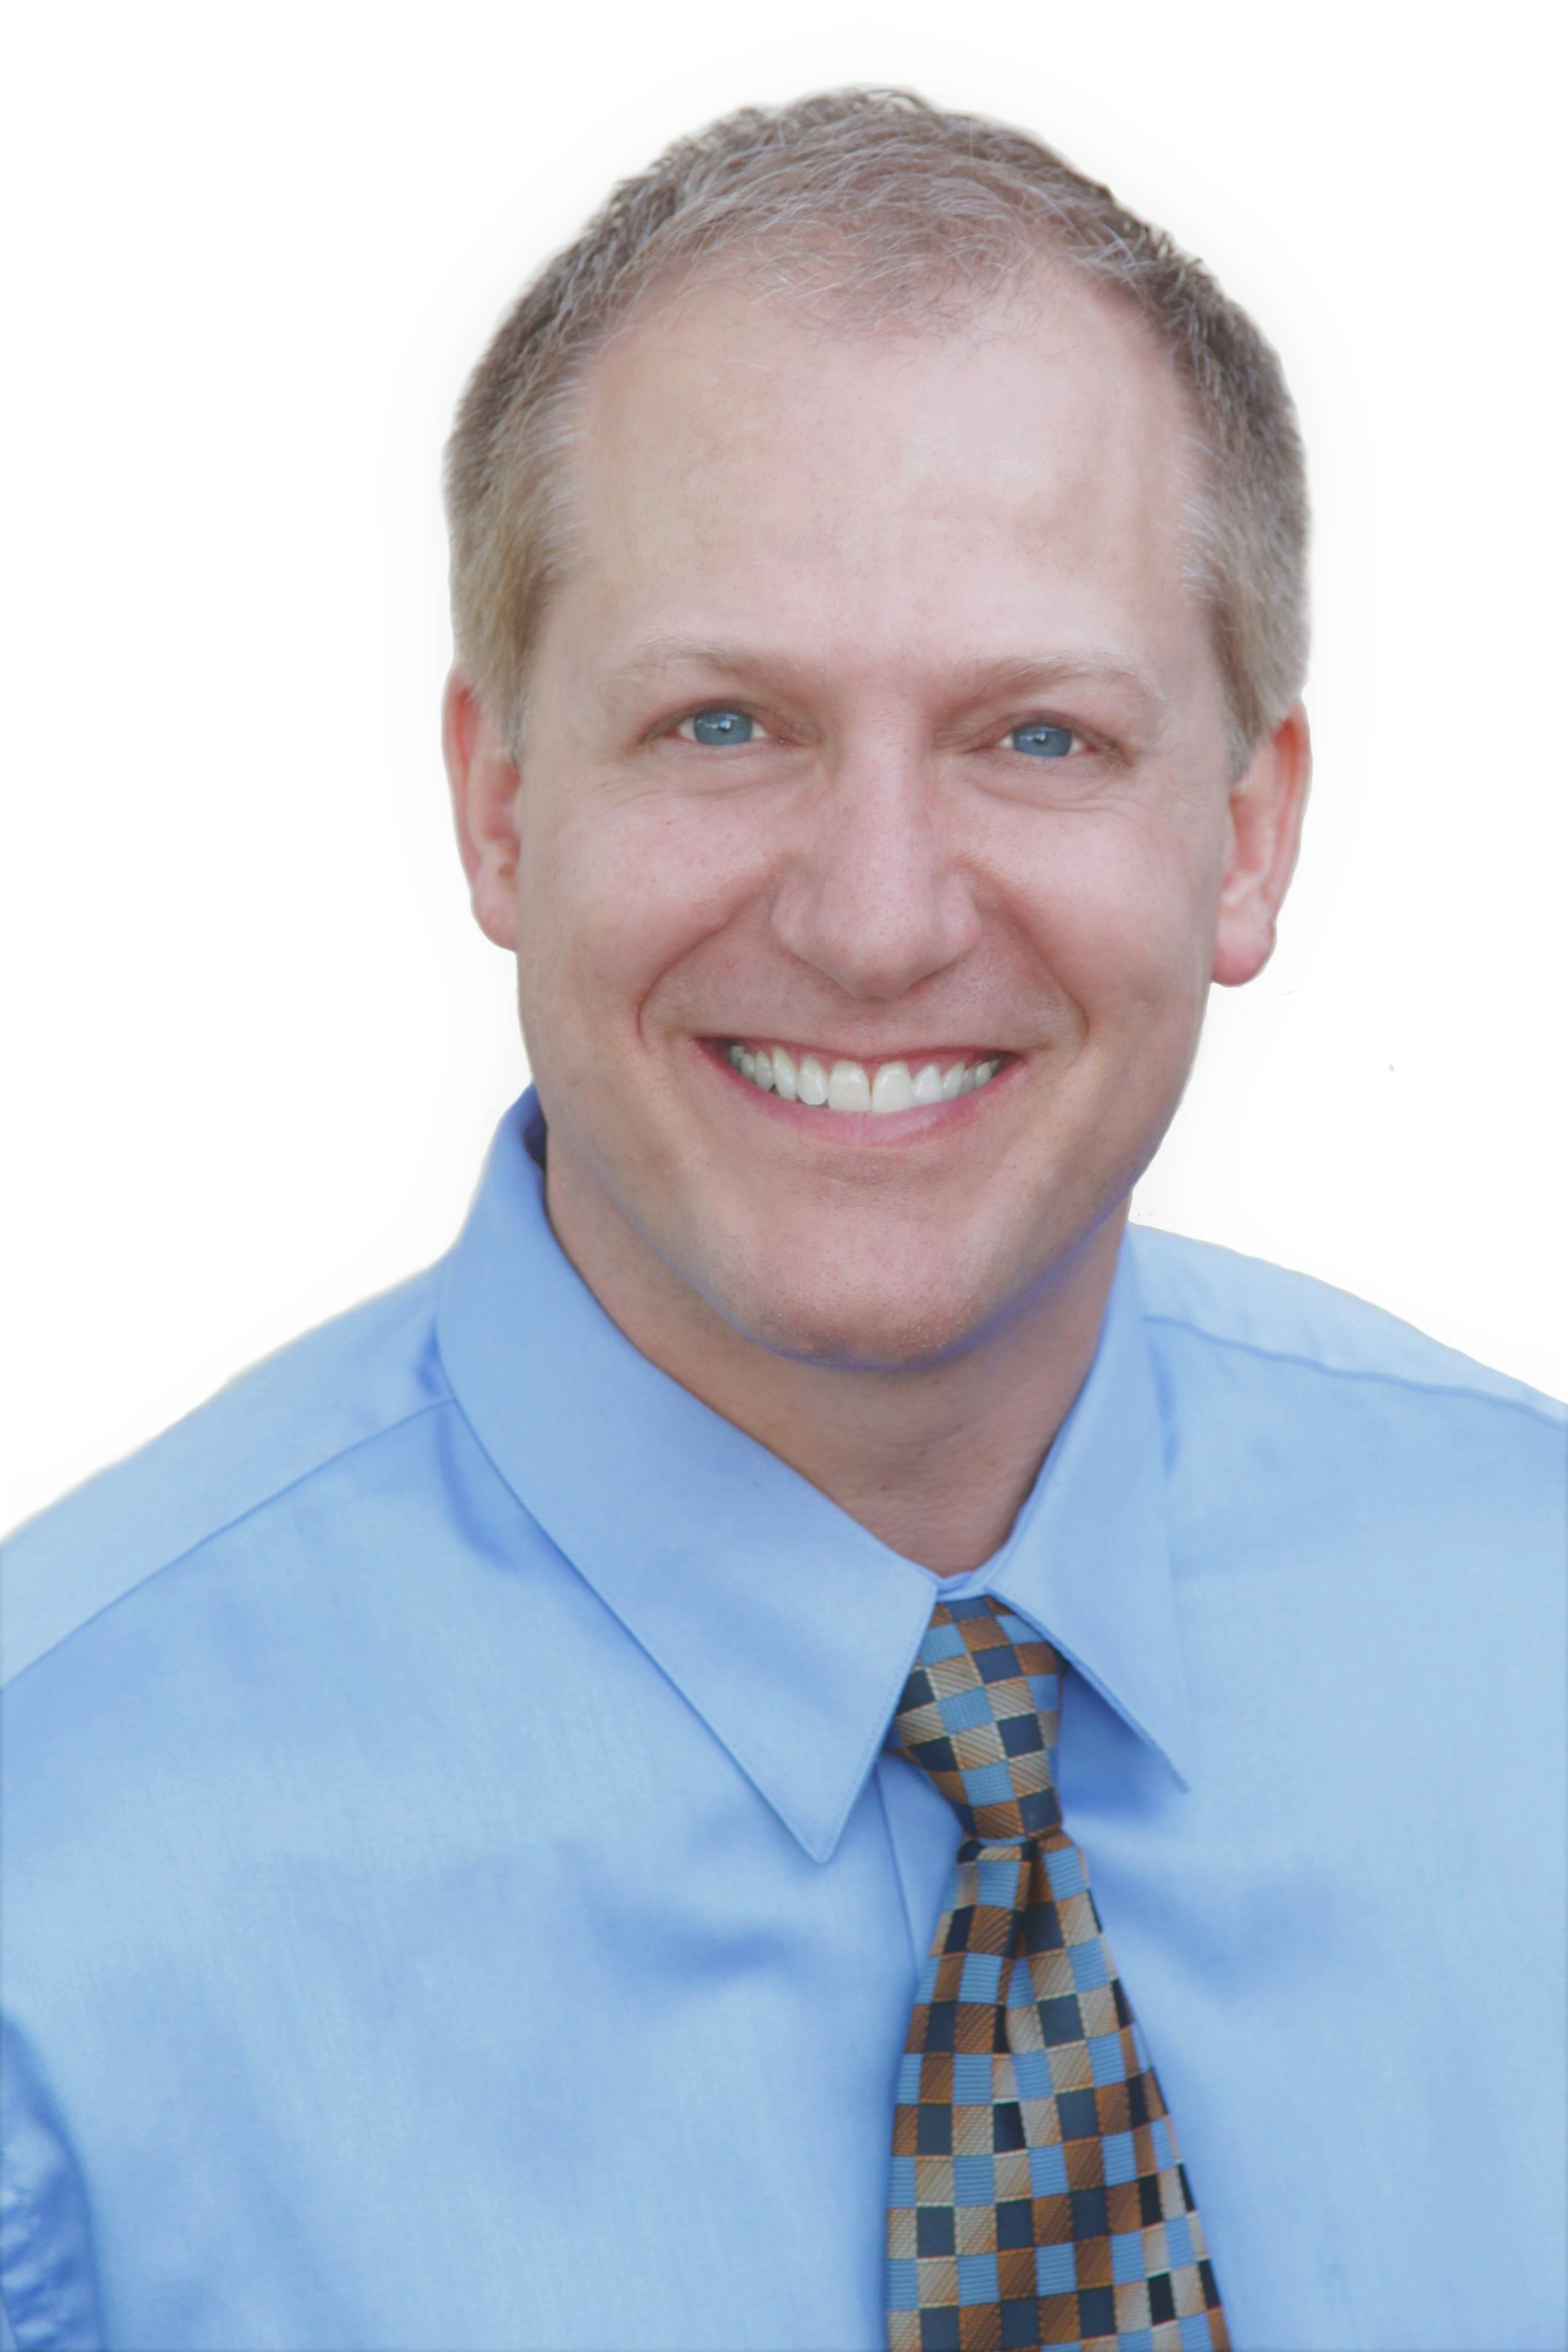 Corey R. Poore